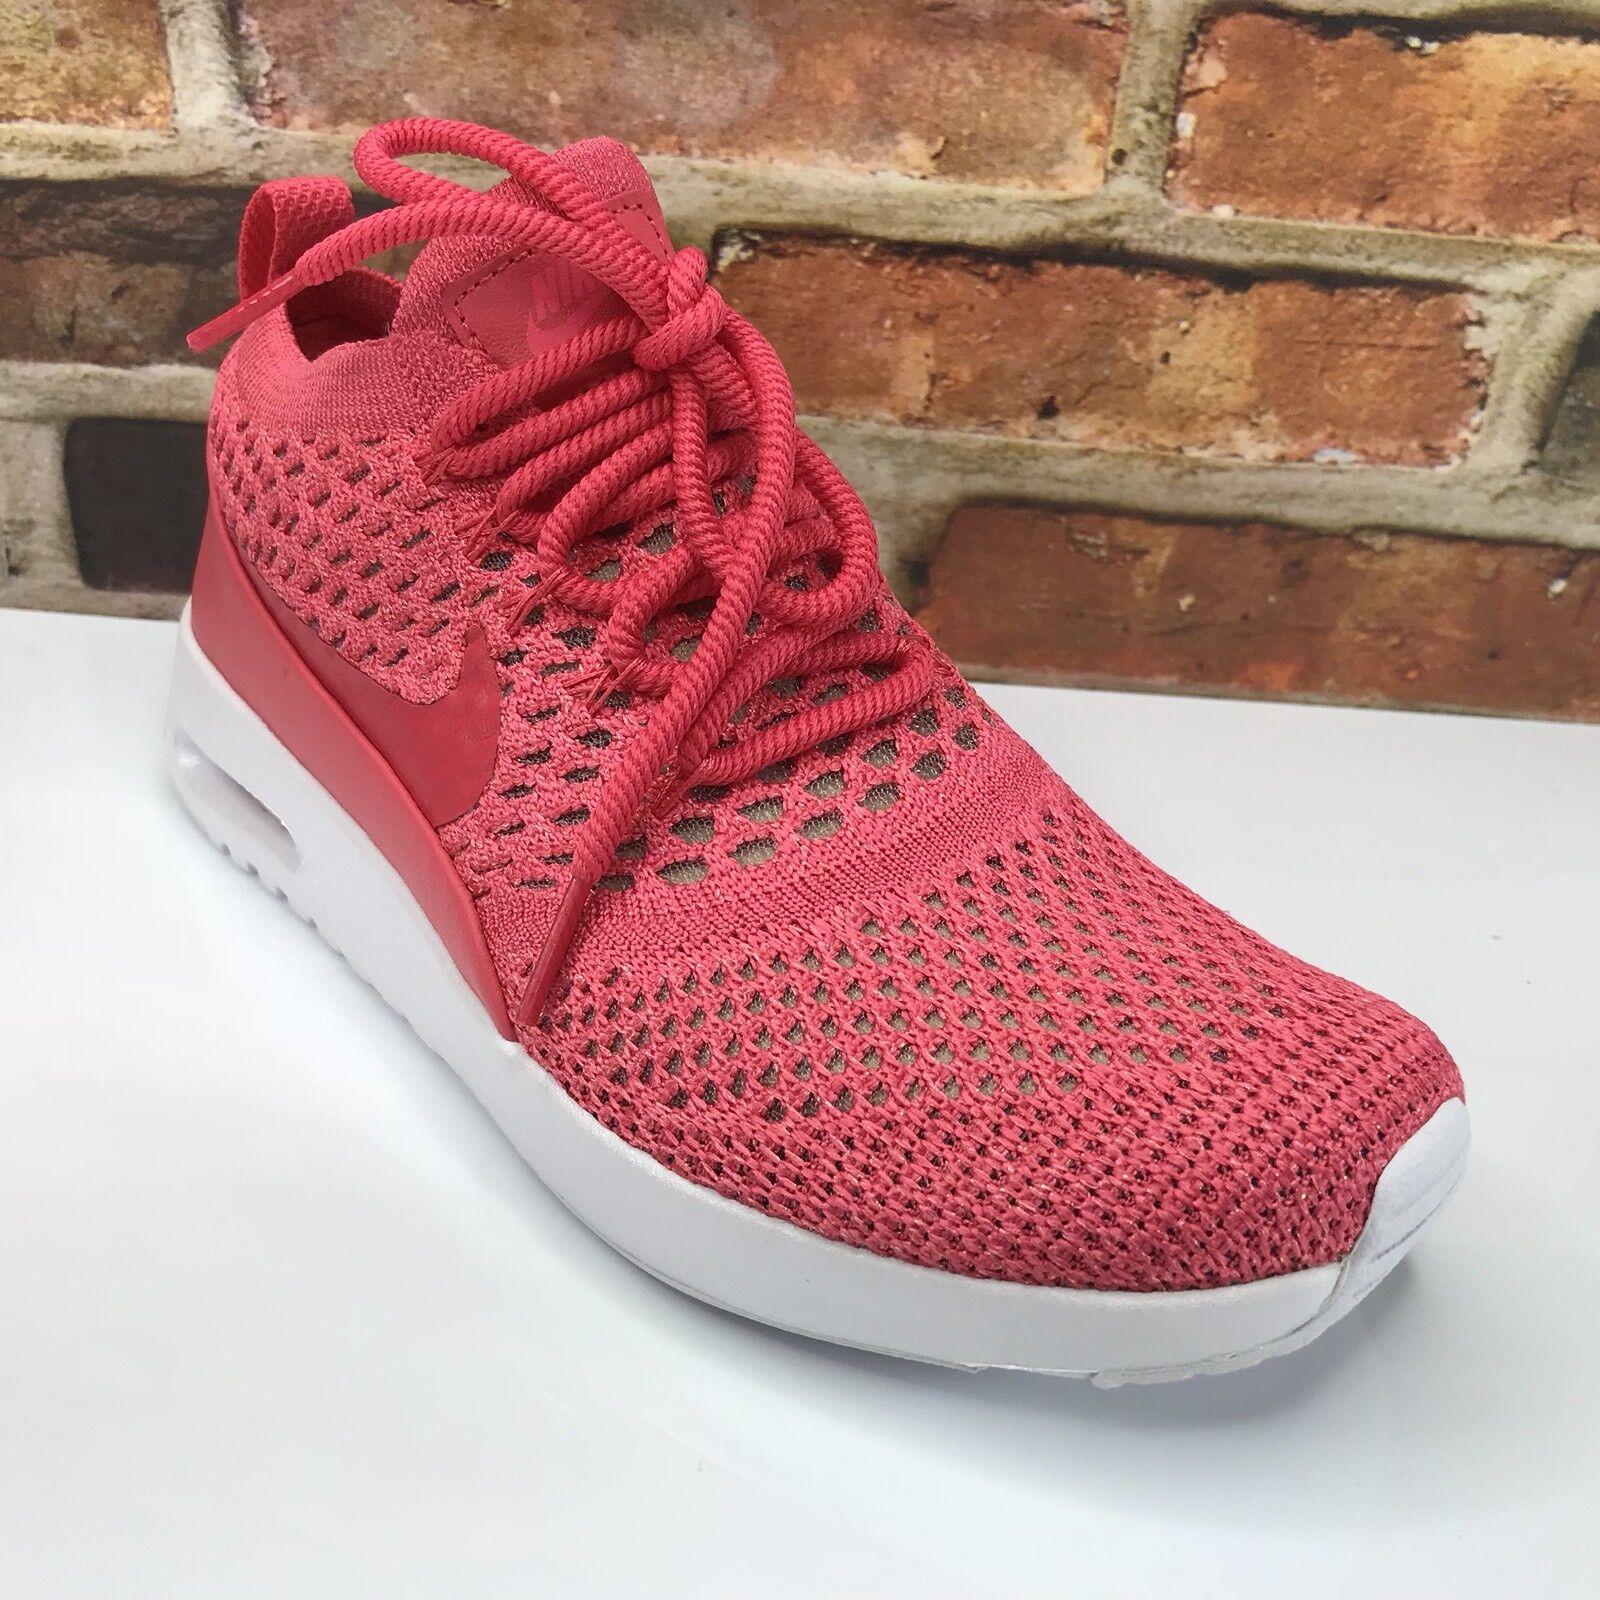 Nike Donna 6 Air Max Thea Ultra FK Scarpe da Corsa Geranio Blu Tinta 881175